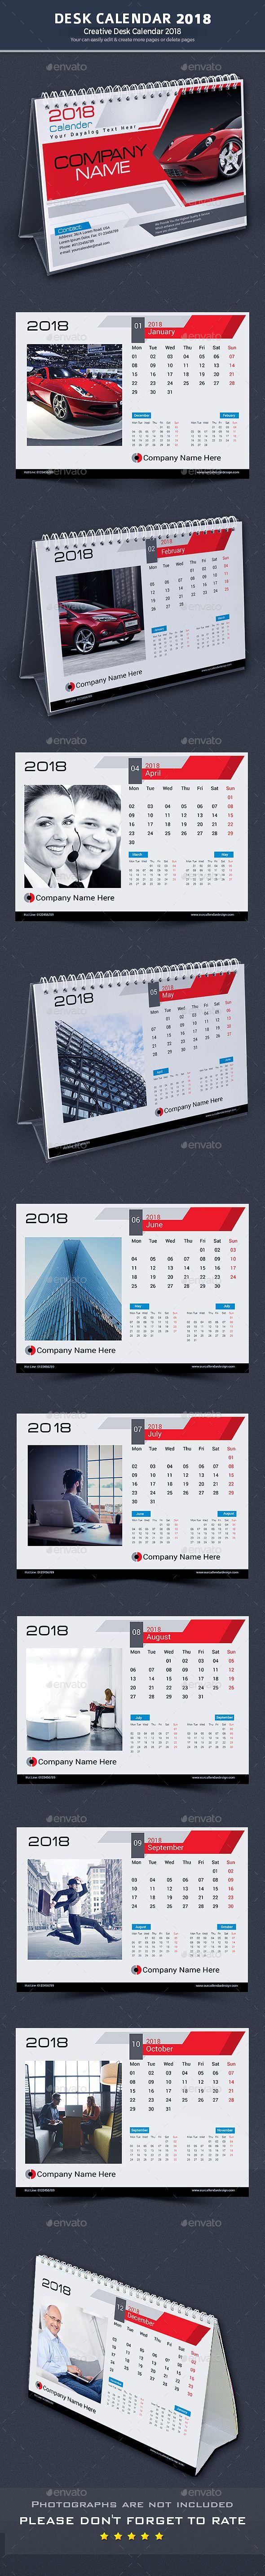 Desk #Calendar 2018 - Calendars #Stationery Download here:  https://graphicriver.net/item/desk-calendar-2018/20387146?ref=alena994